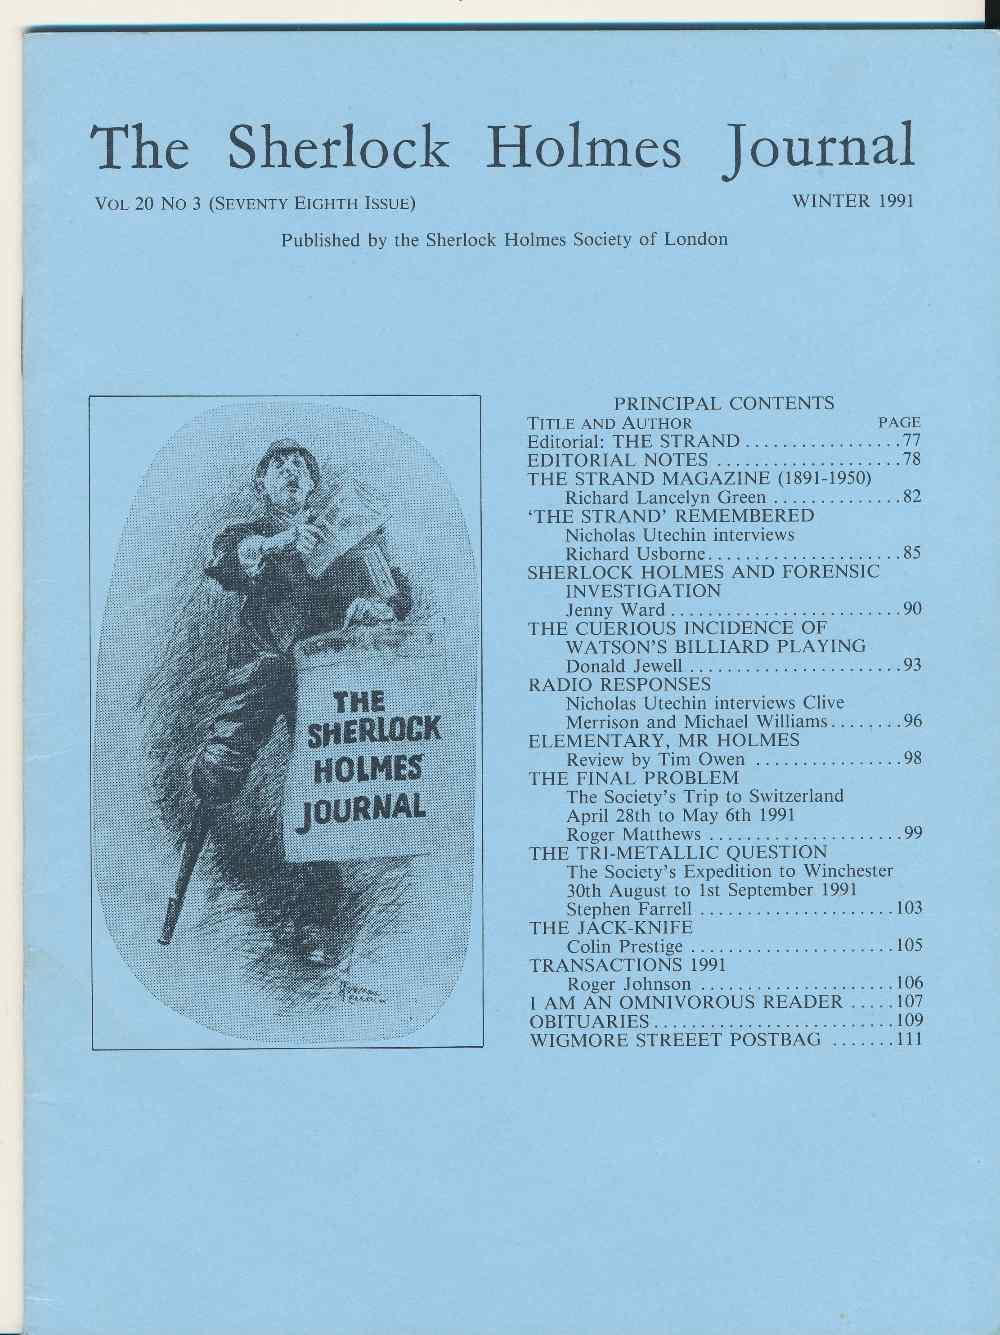 The Sherlock Holmes Journal